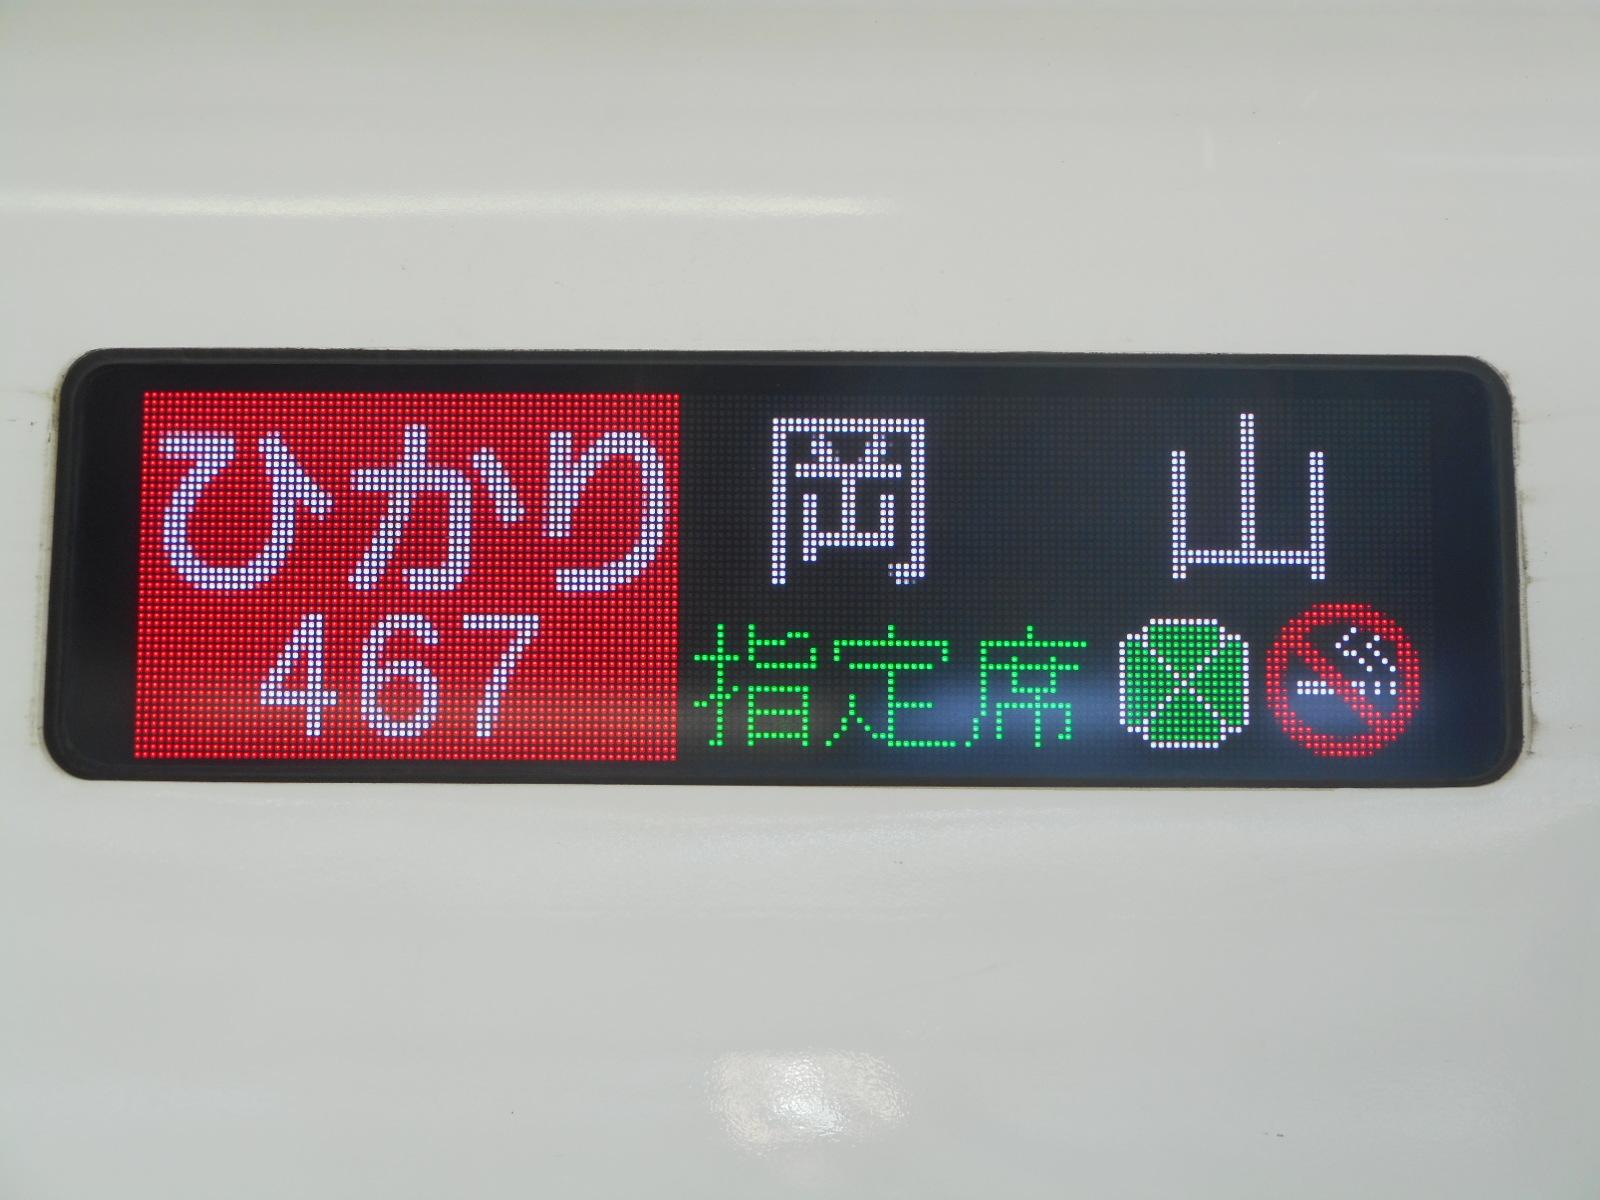 4007-03-05-03